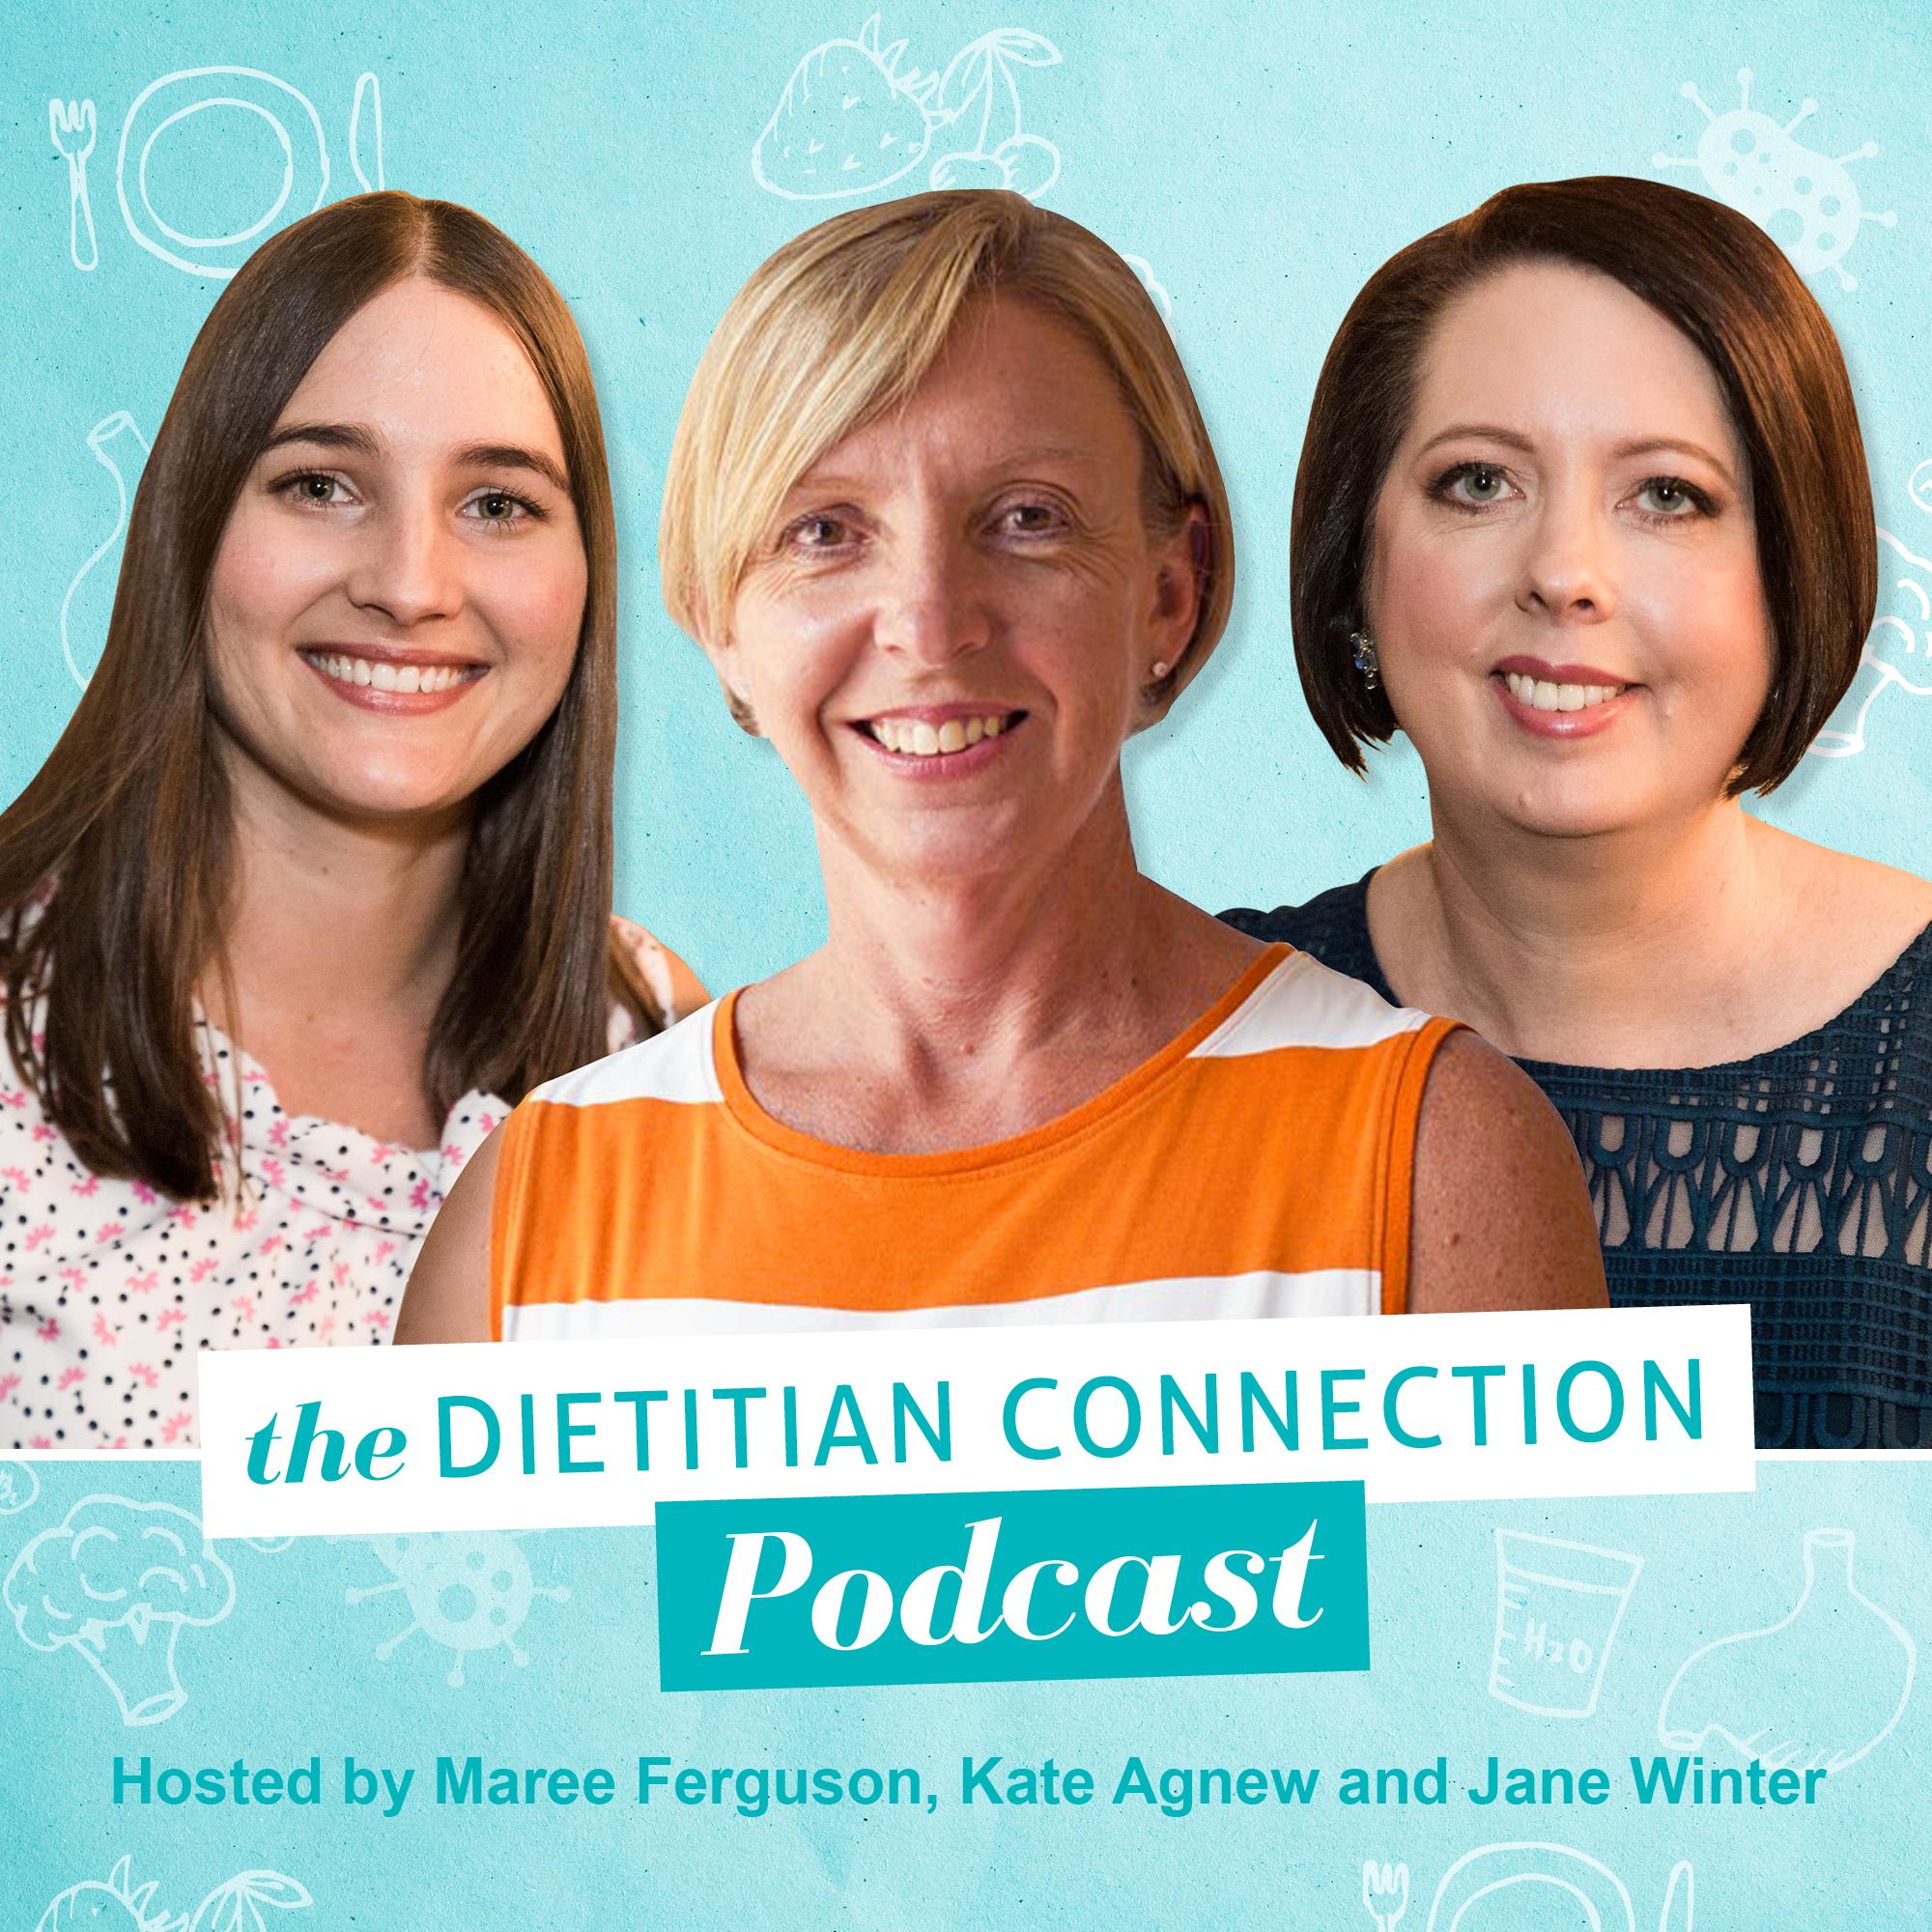 Dietitian Connection Podcast show art